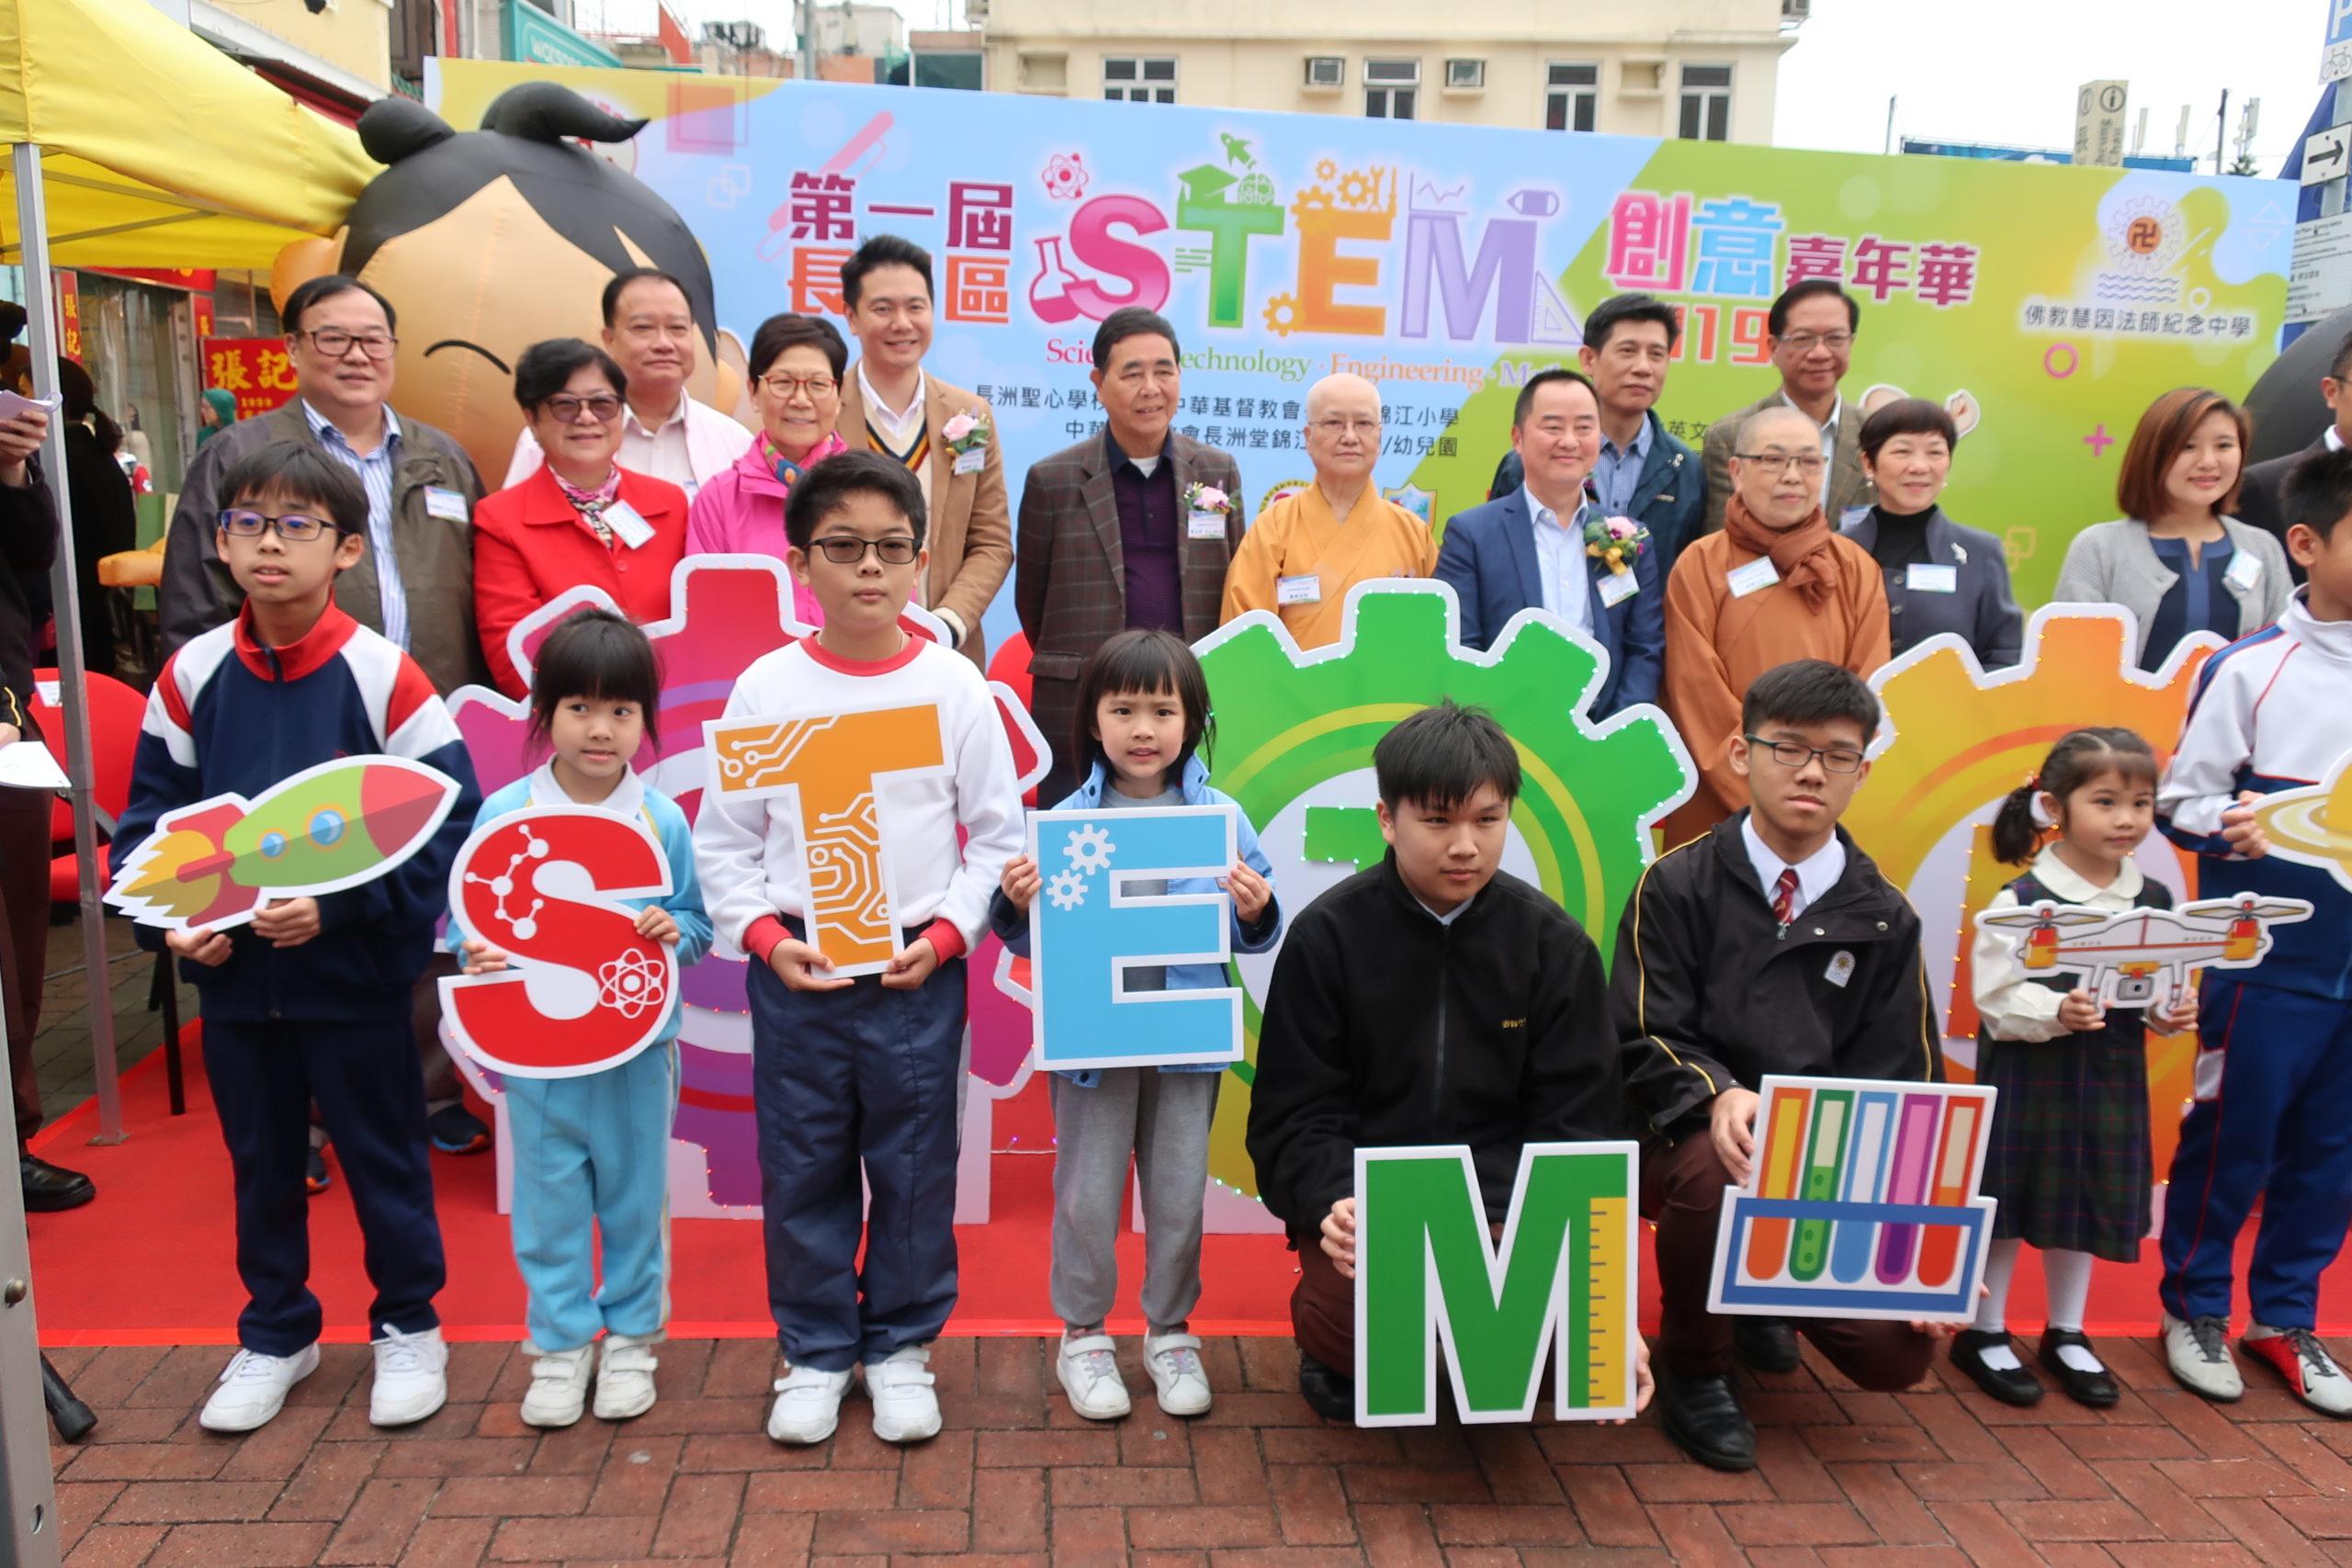 (18-19年度)2019-2-23–參與第一屆長洲STEM創意嘉年華